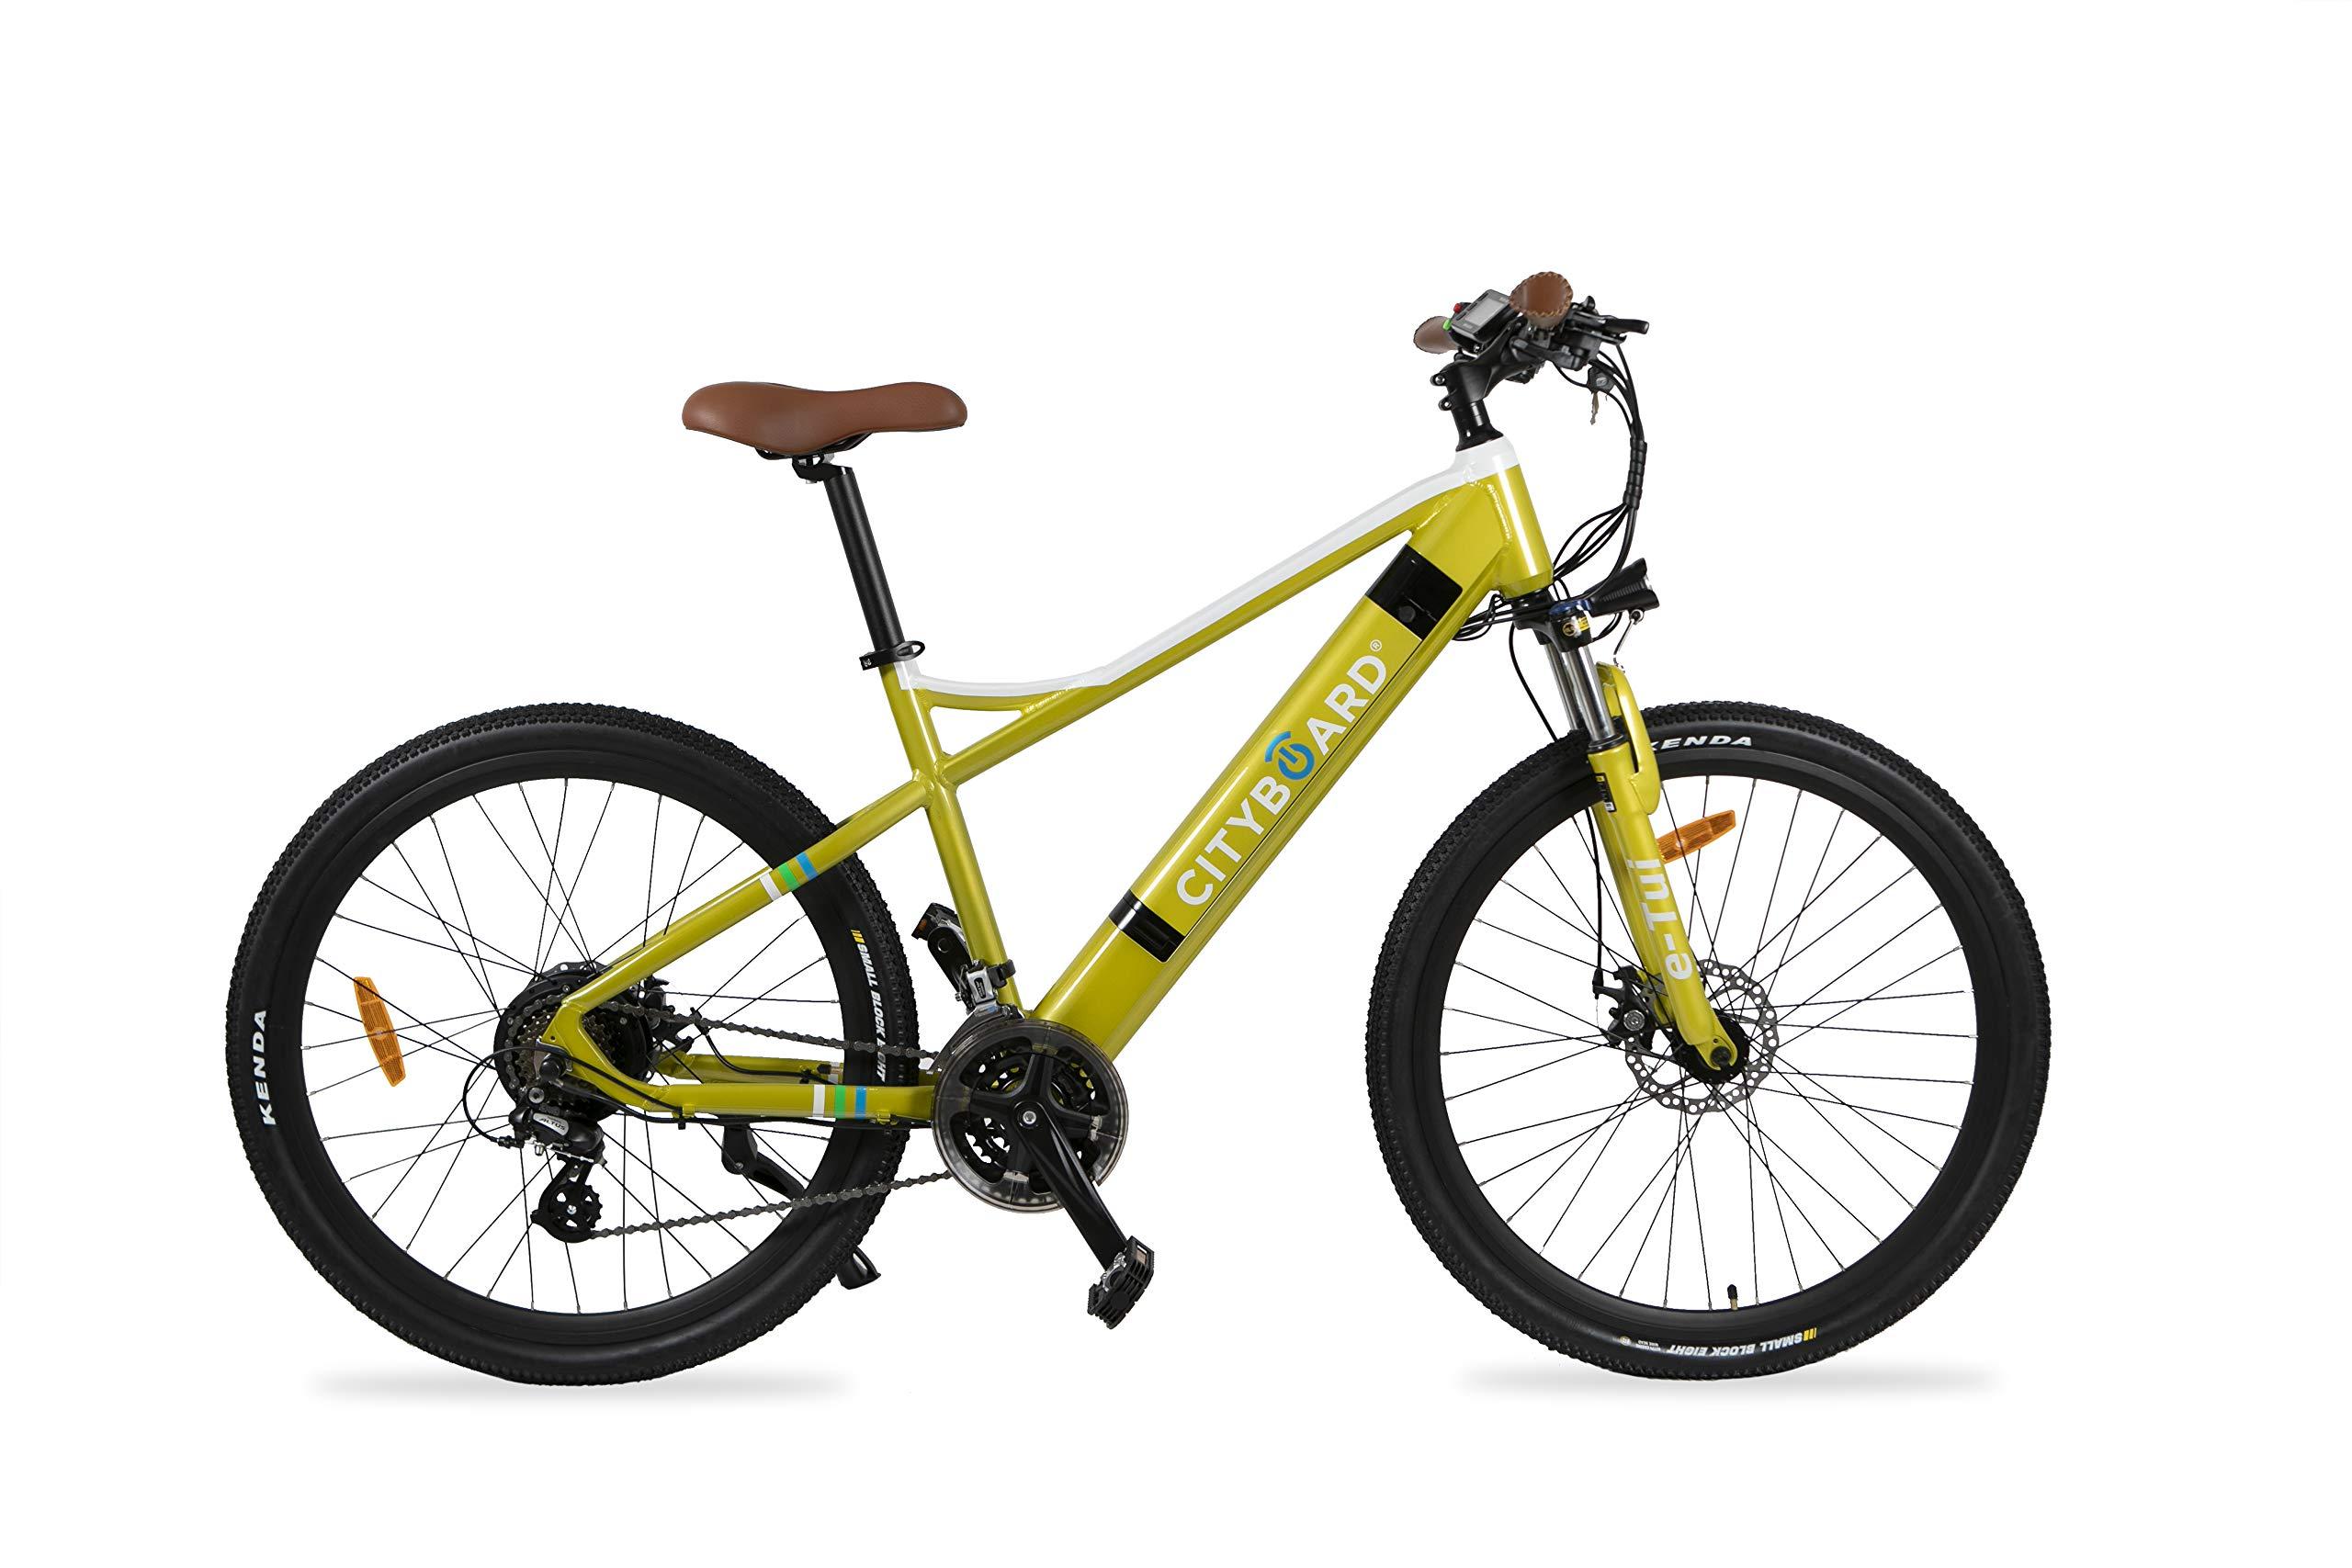 Cityboard E- Tui Bicicleta Eléctrica, Unisex Adulto, Negro/Azul ...